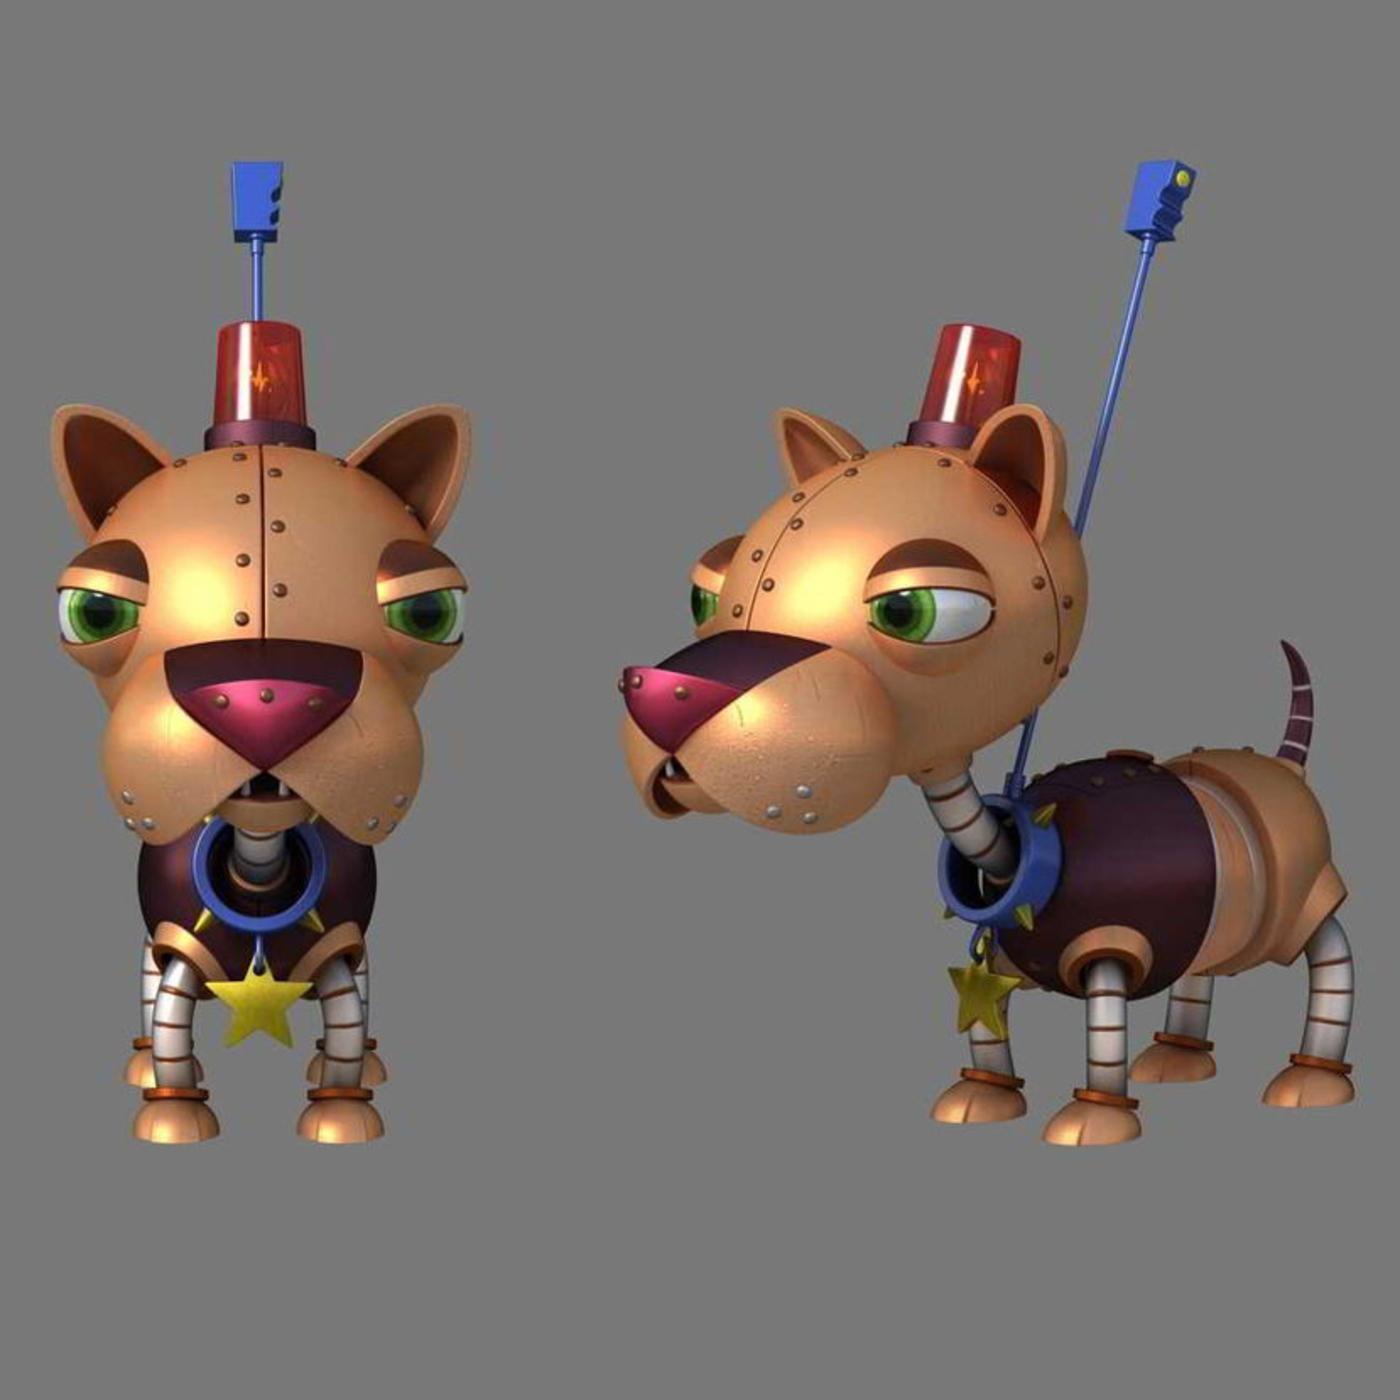 Robo Police Dog